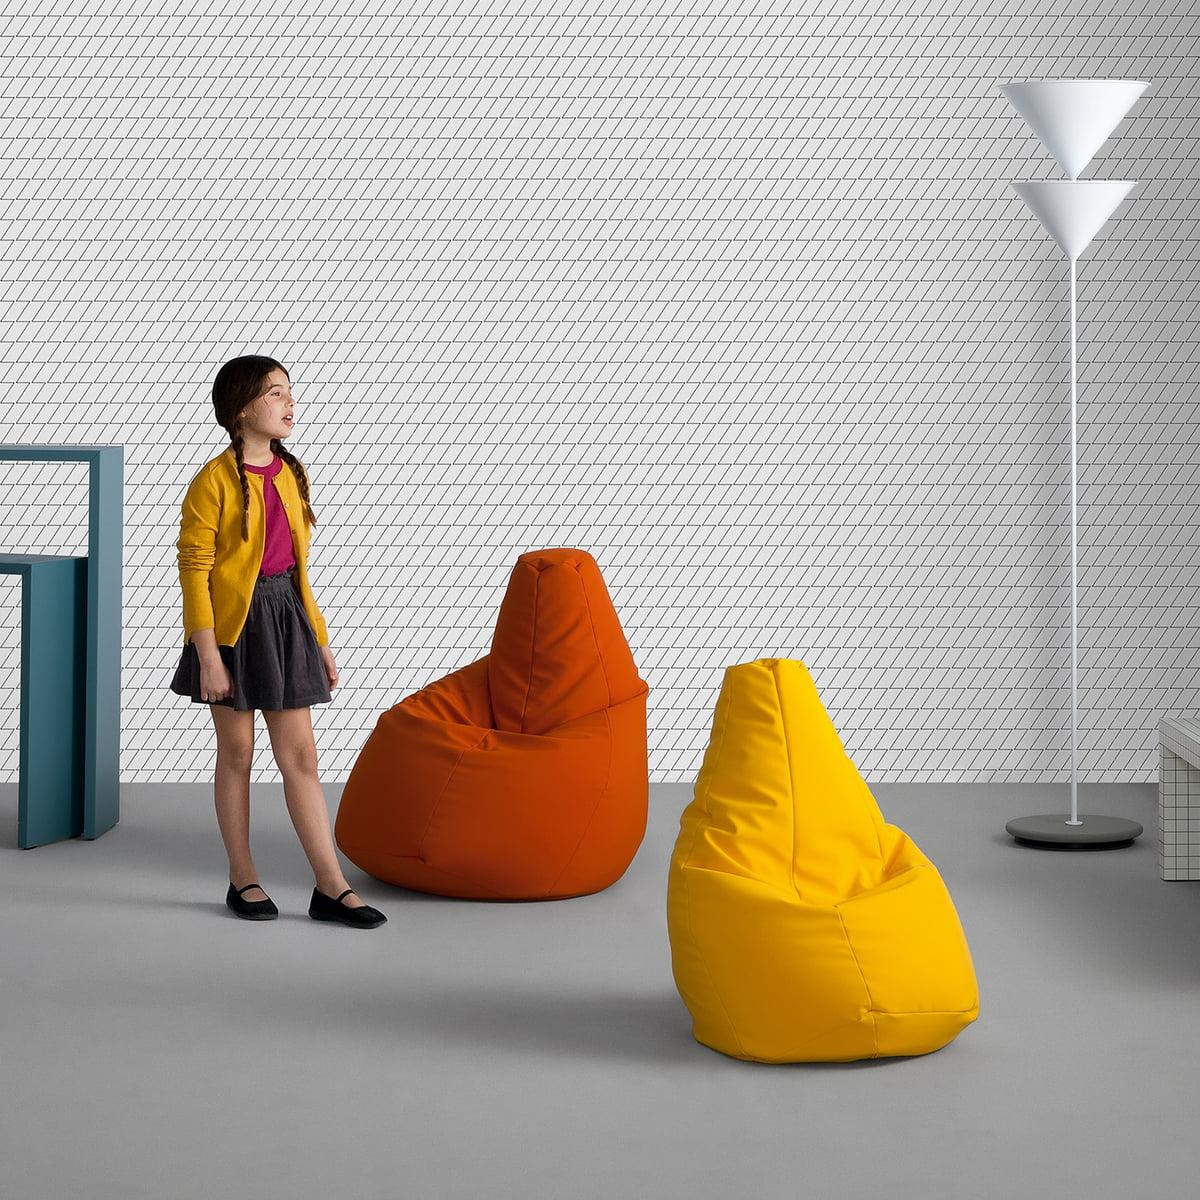 zanotta sacco medium. Black Bedroom Furniture Sets. Home Design Ideas